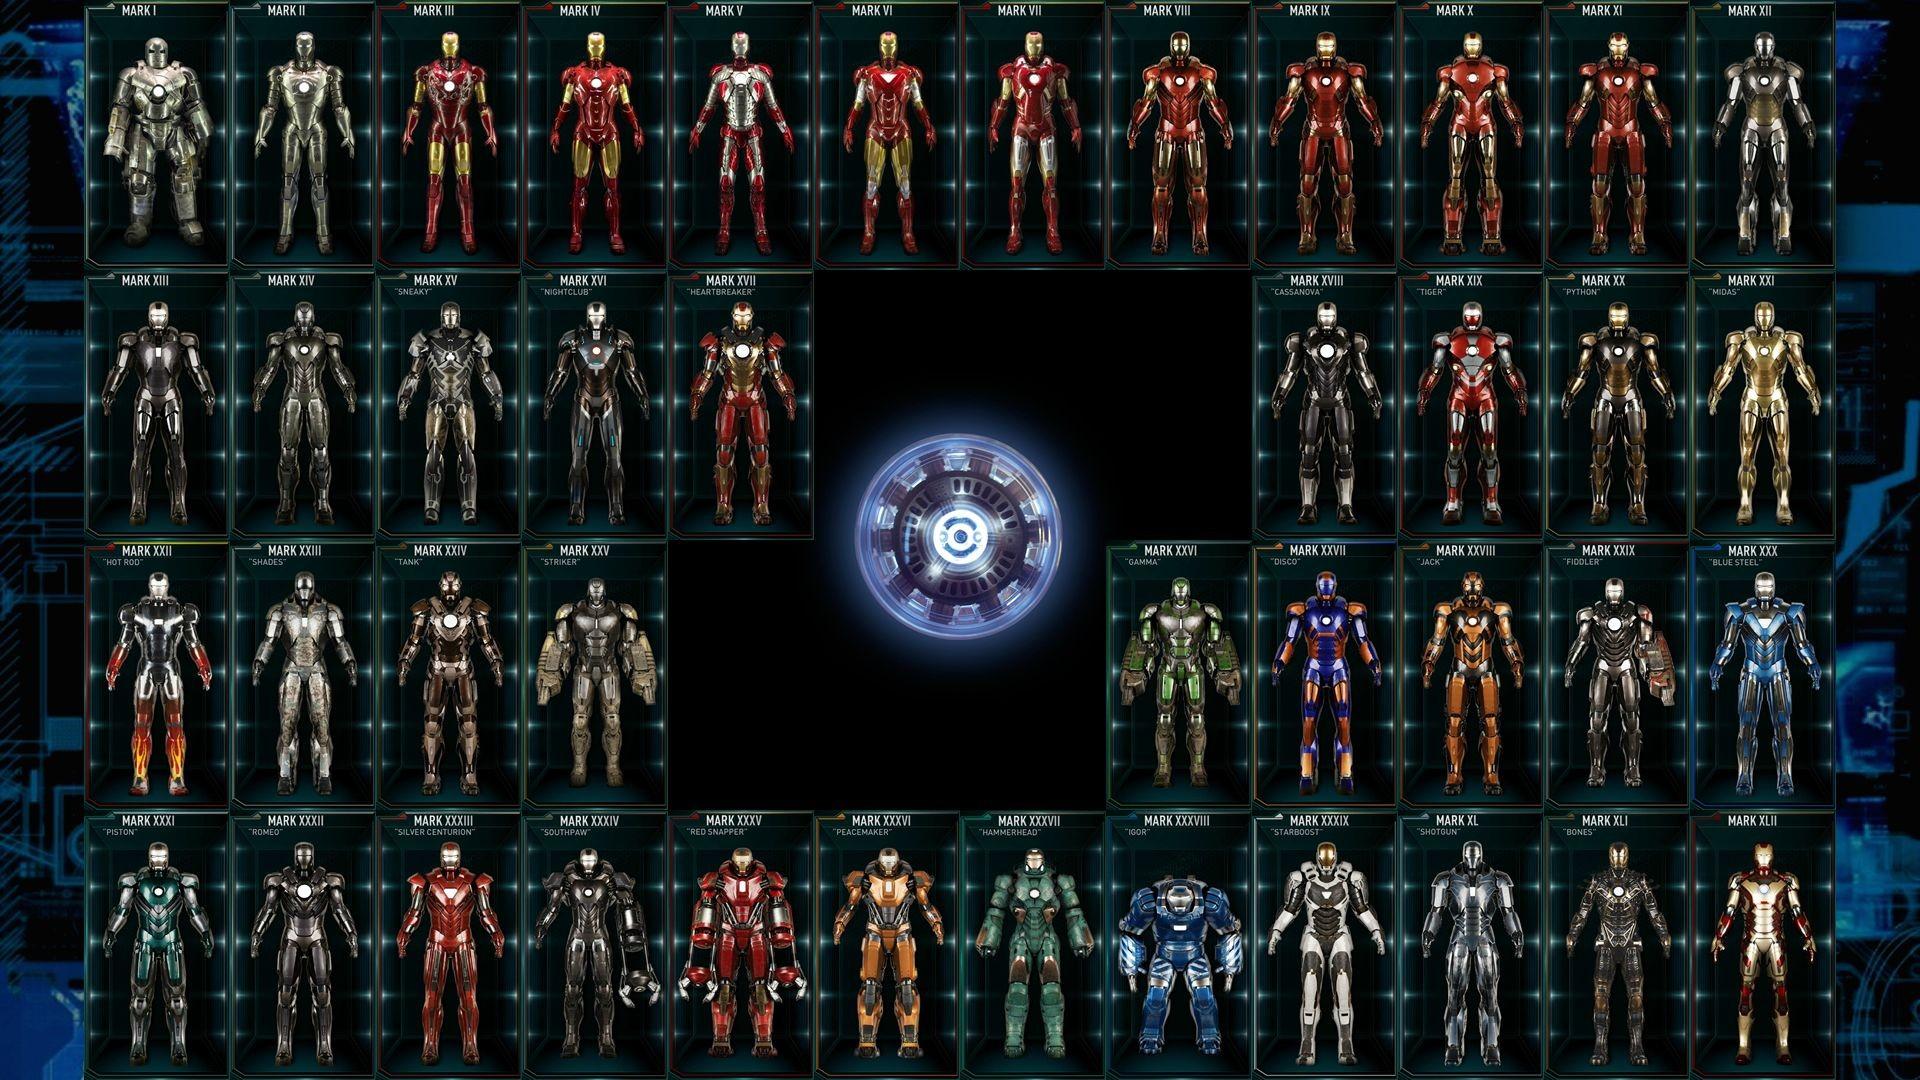 Wallpaper Iron Man Marvel Cinematic Universe Stage